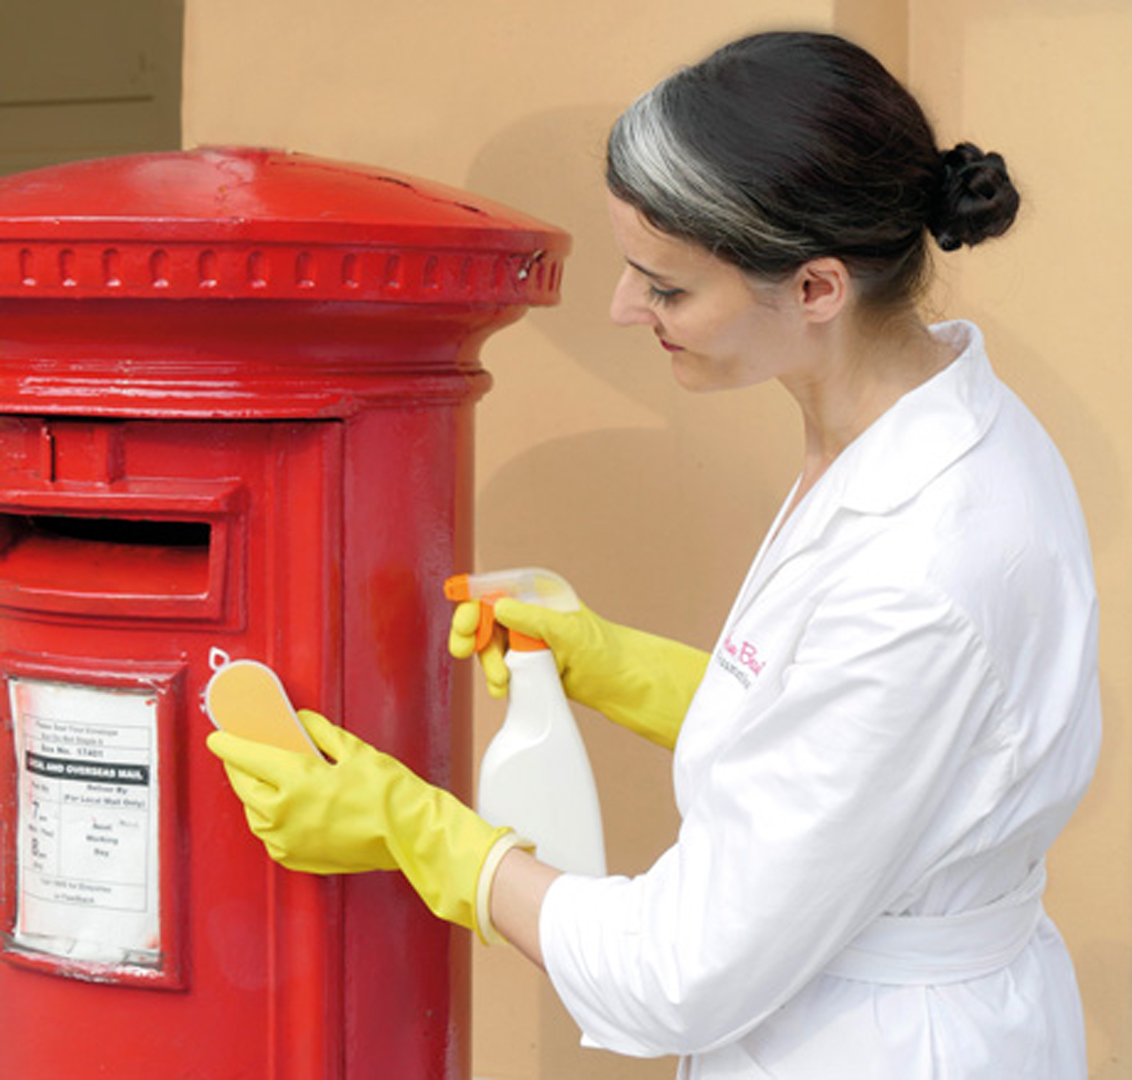 ©, Elke Reinhuber, The Urban Beautician: Mail Polish